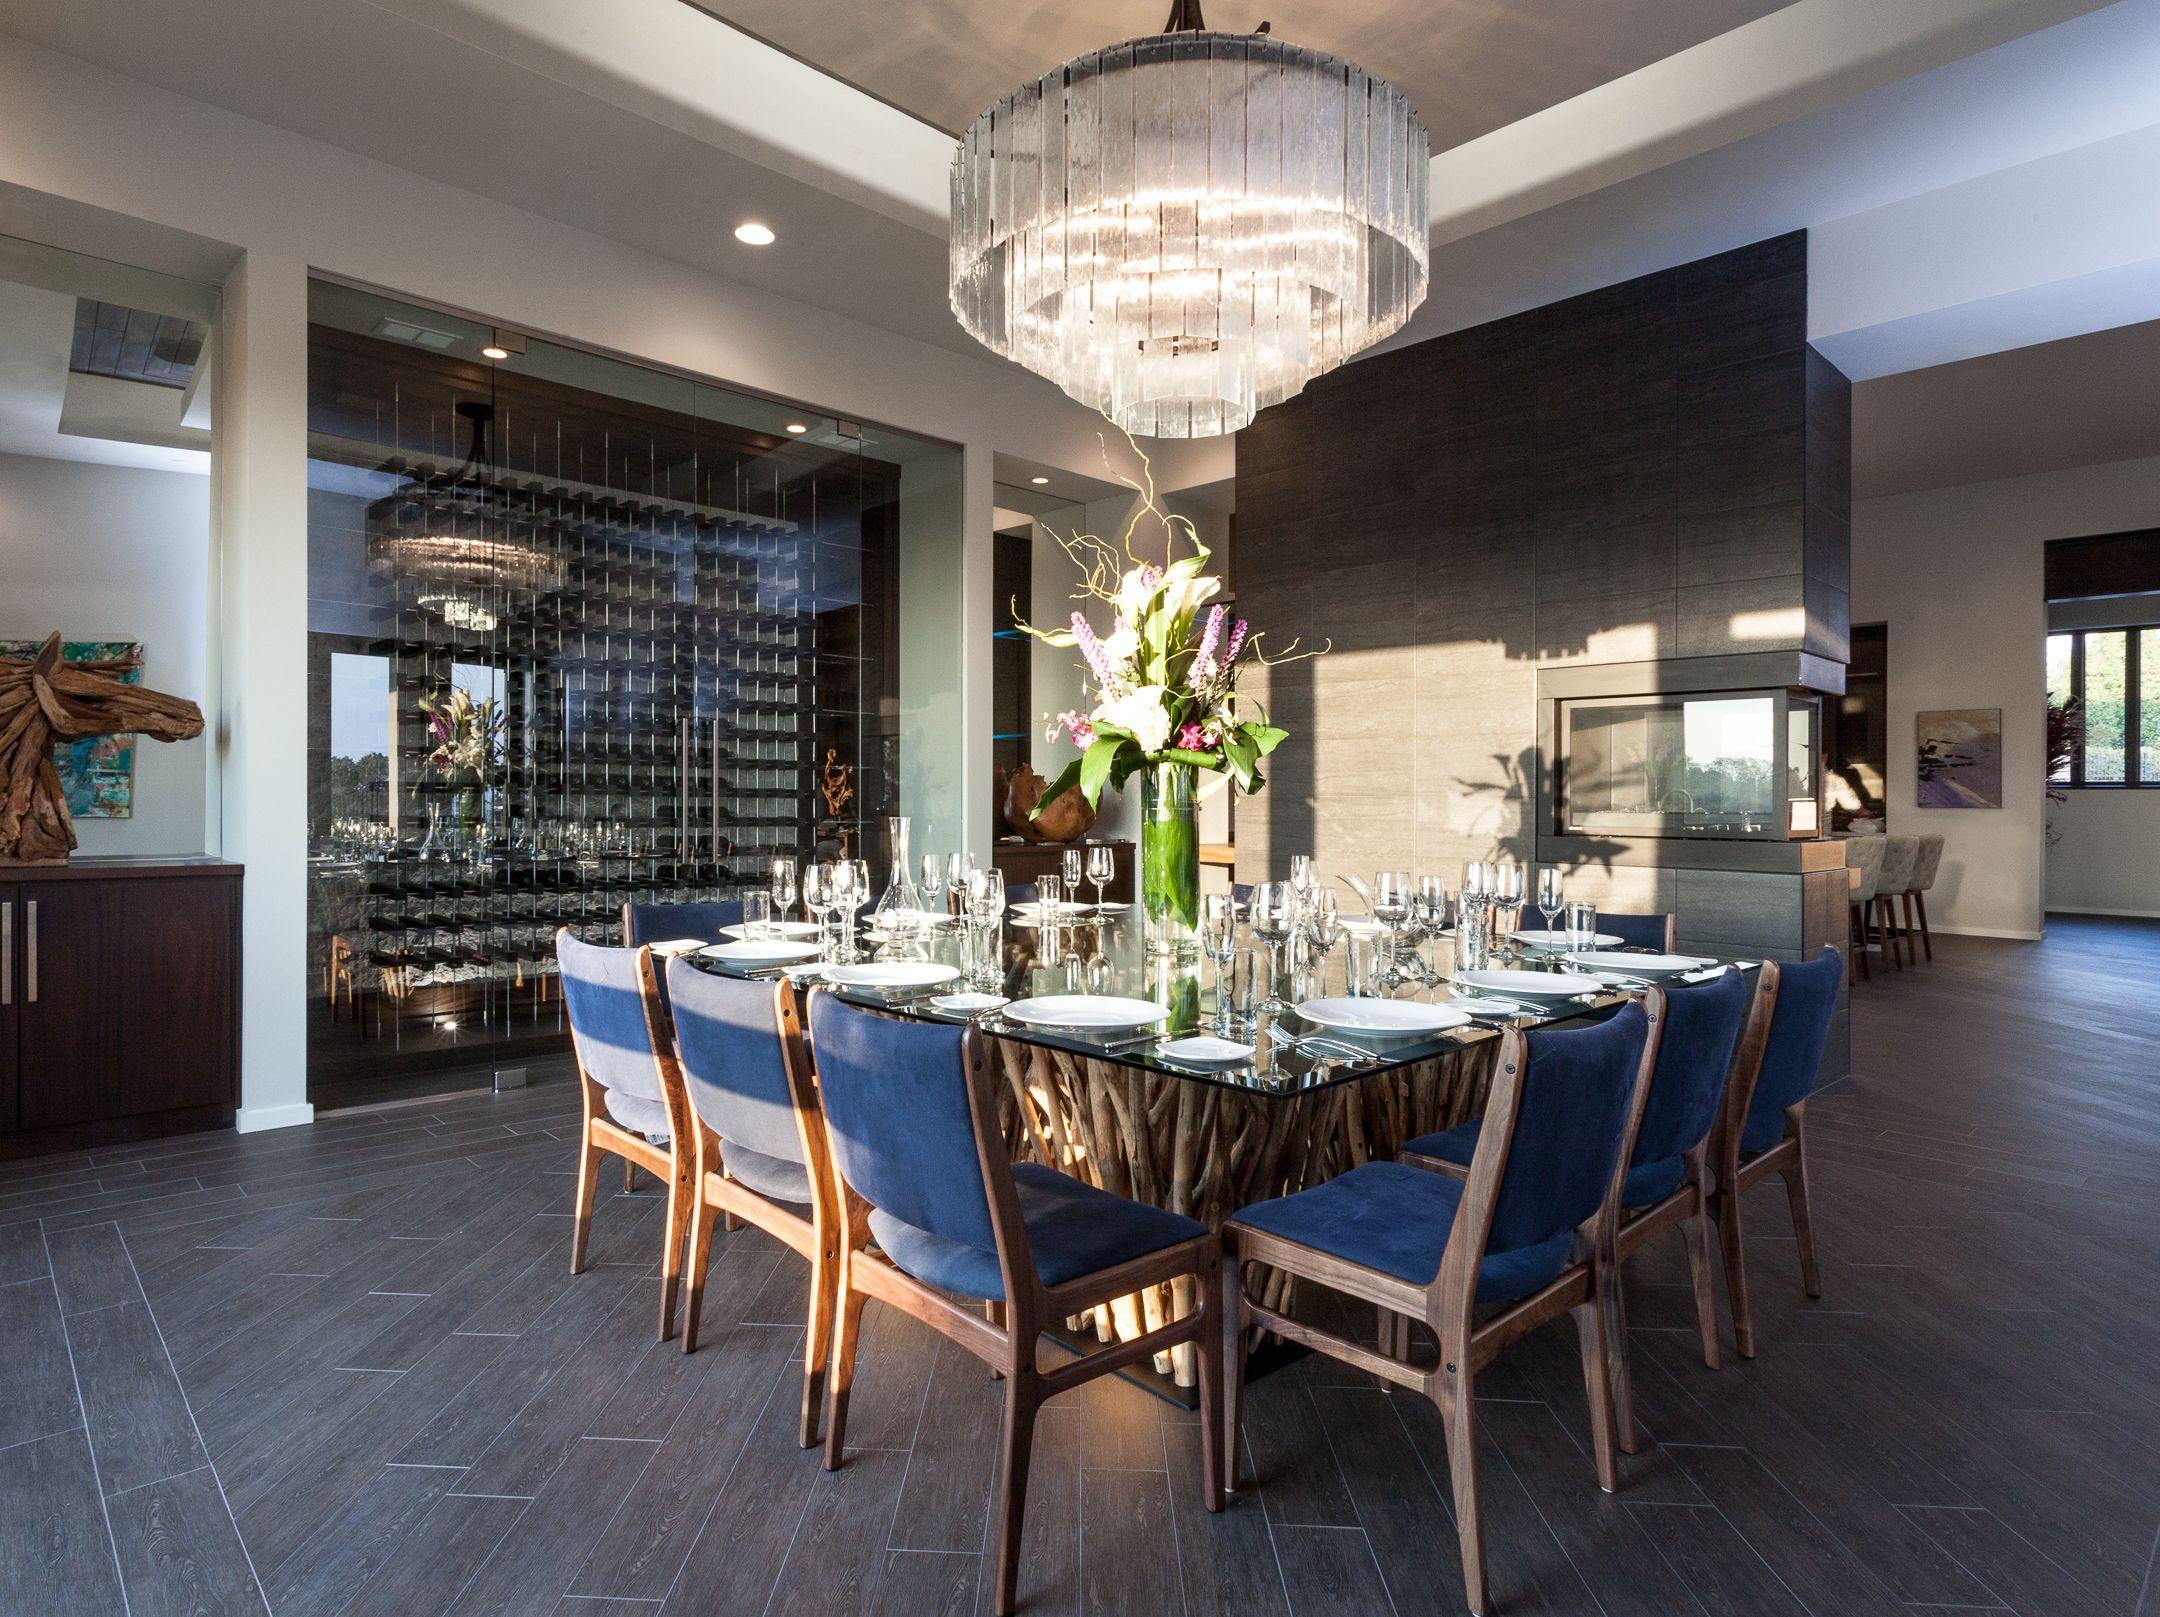 Joanna Wing Realtor Broker Cavitt Ranch Granite Bay Showcase Home Granite Bay Luxury Real Estate Luxury Realtor